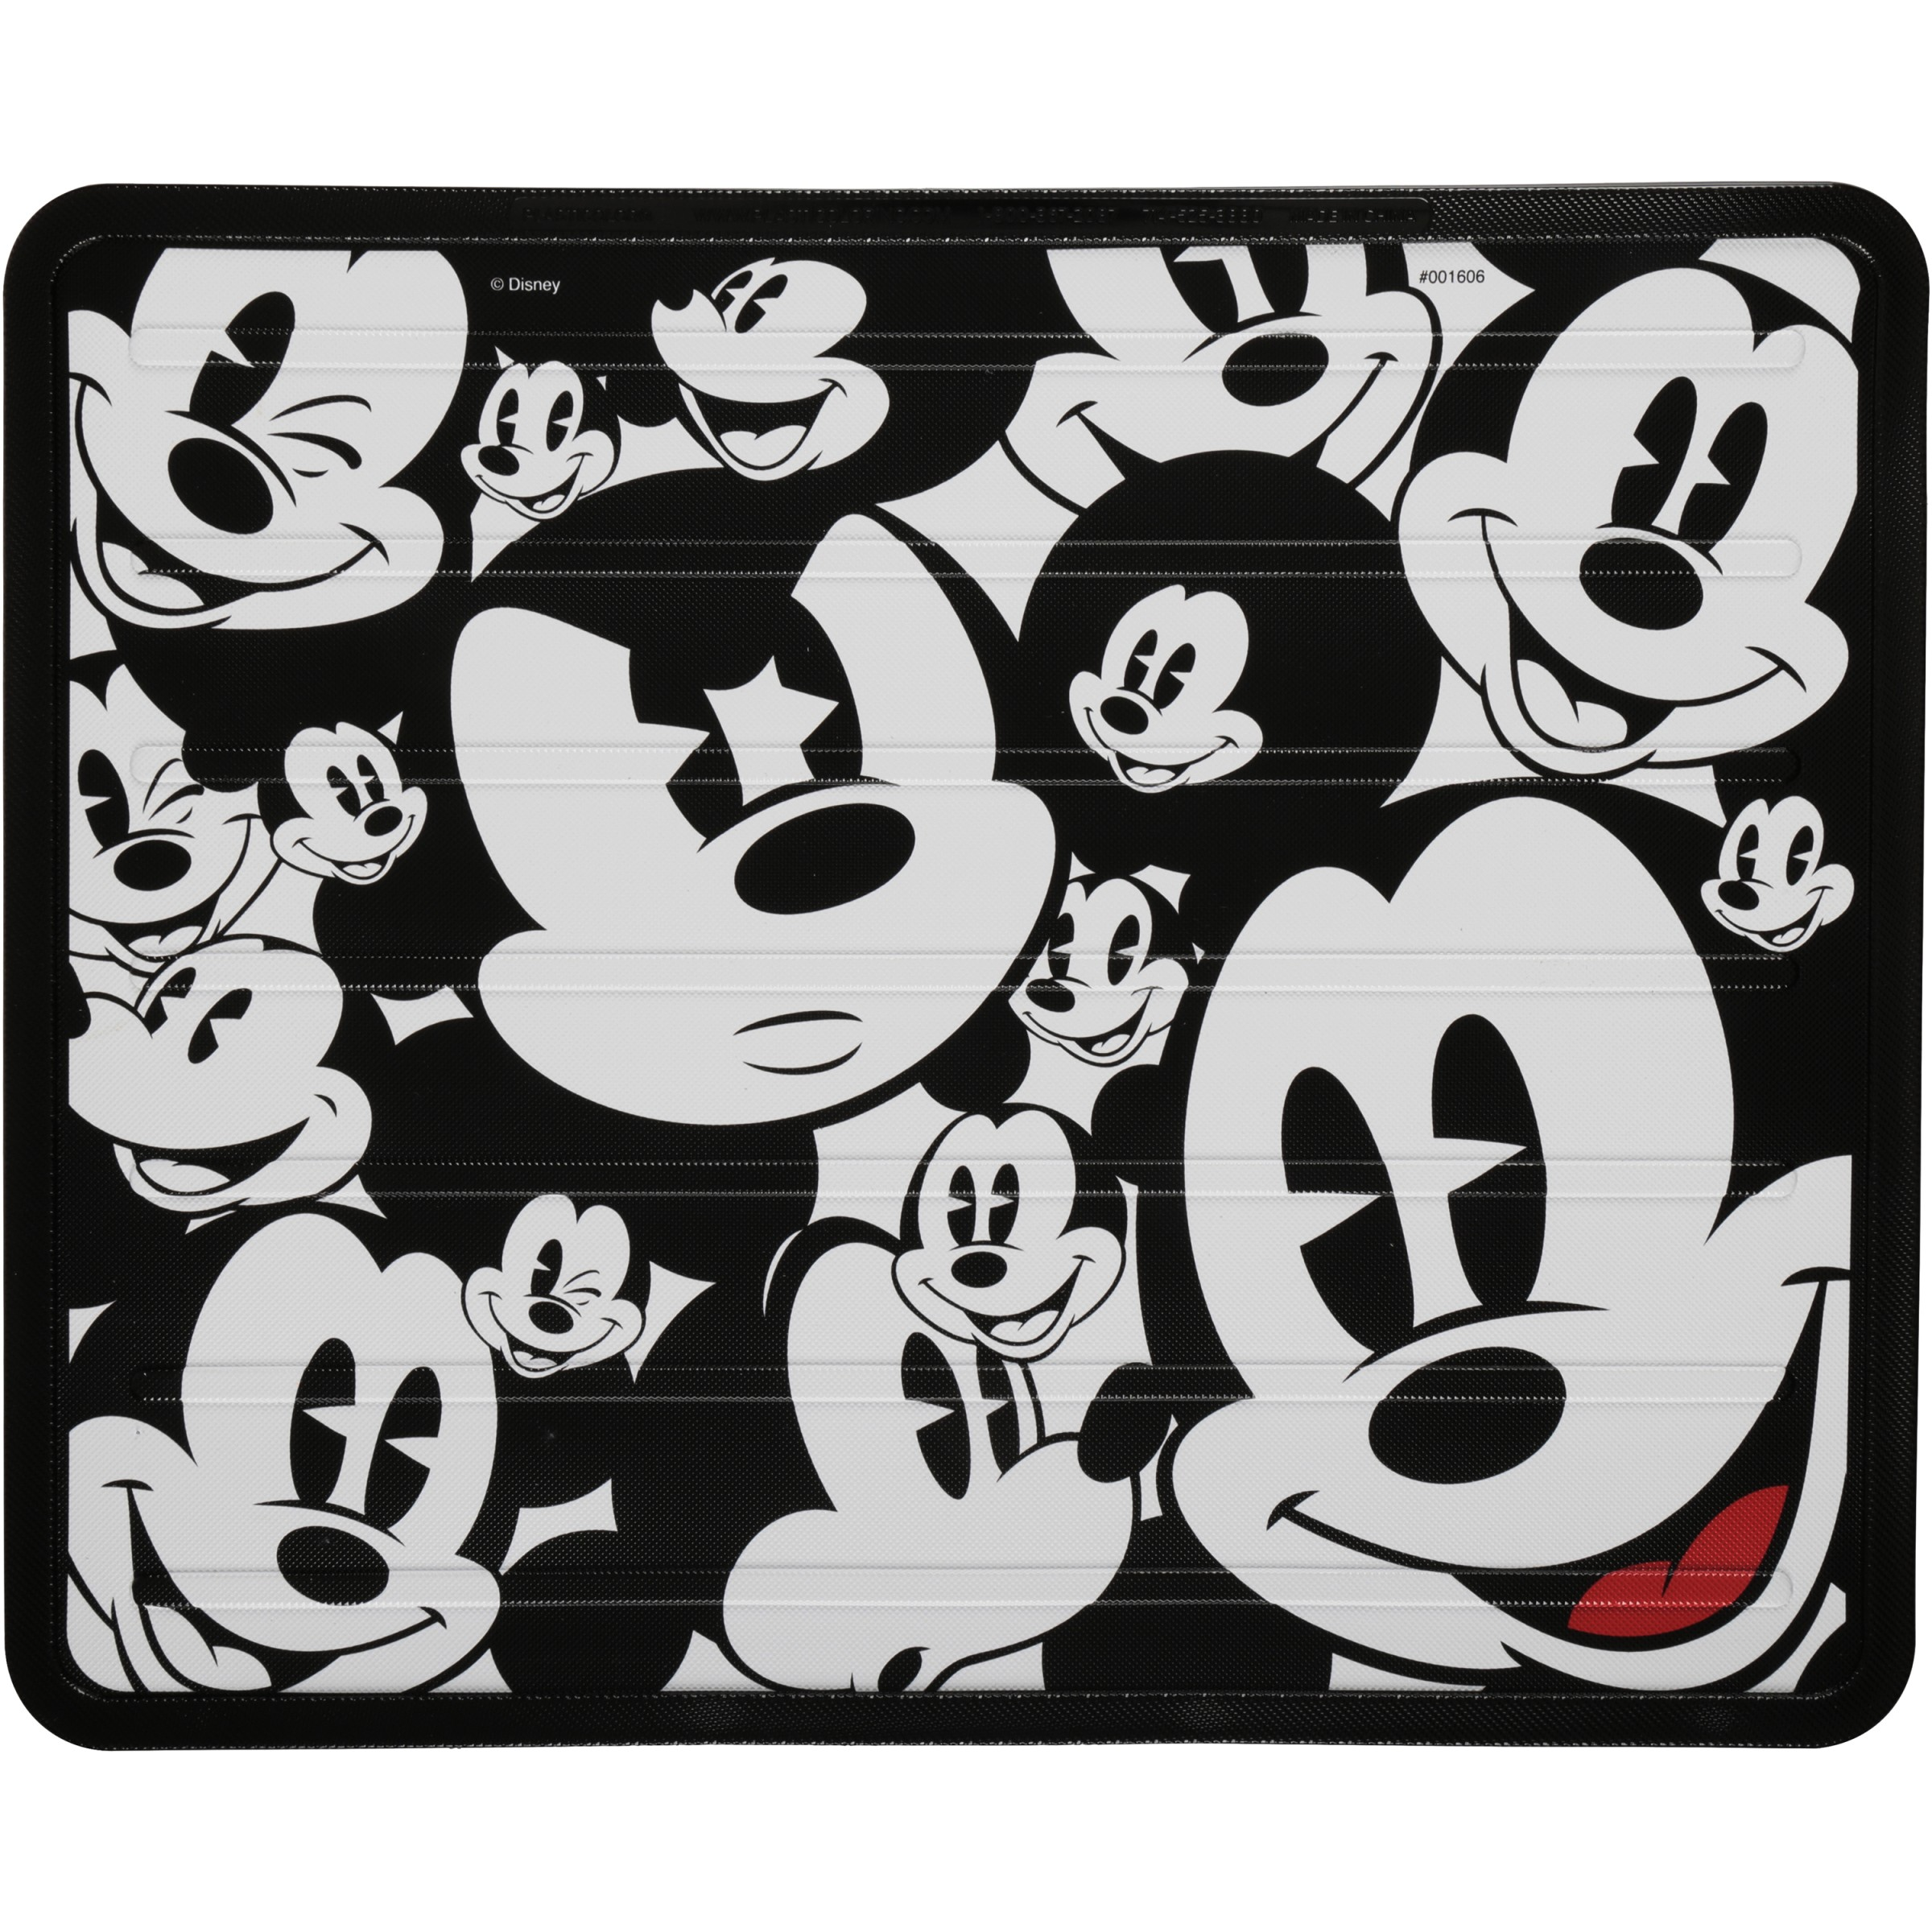 PlastiColor Disney Mickey Mouse Utility Mat